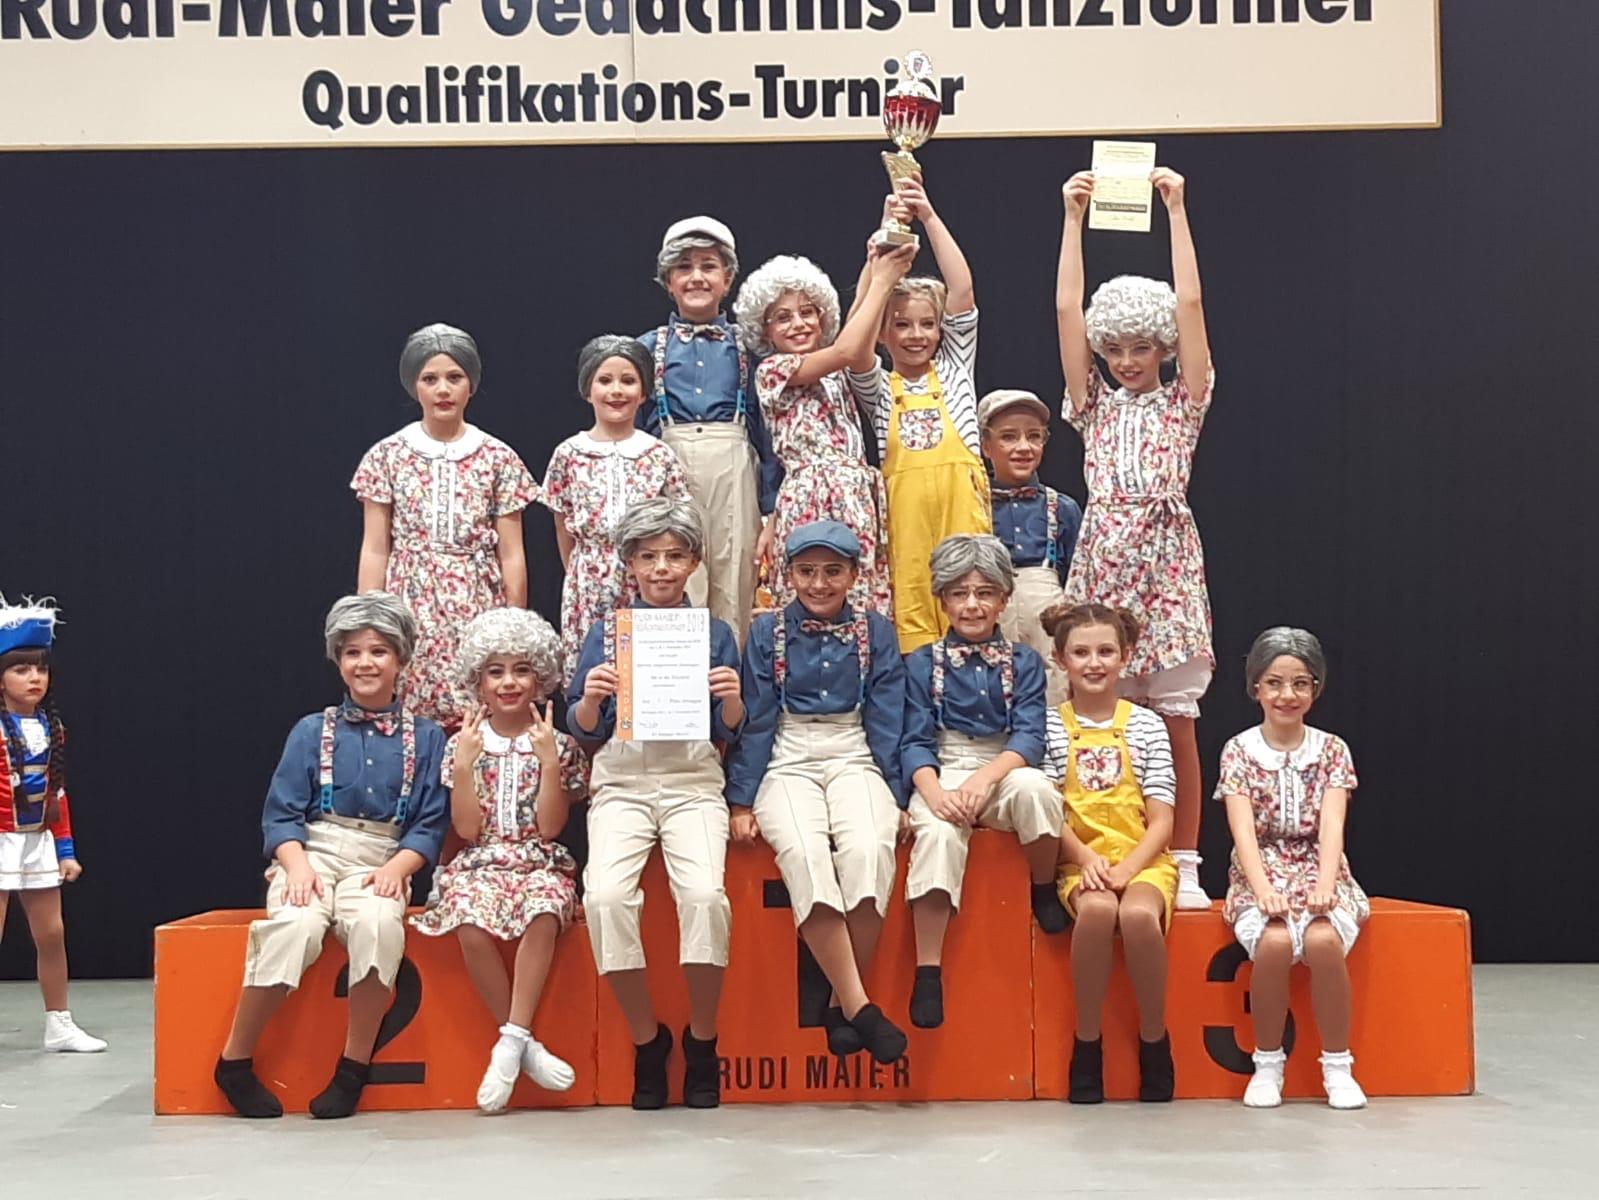 Minischnooge - SV Knielingen - Die Holzbiere